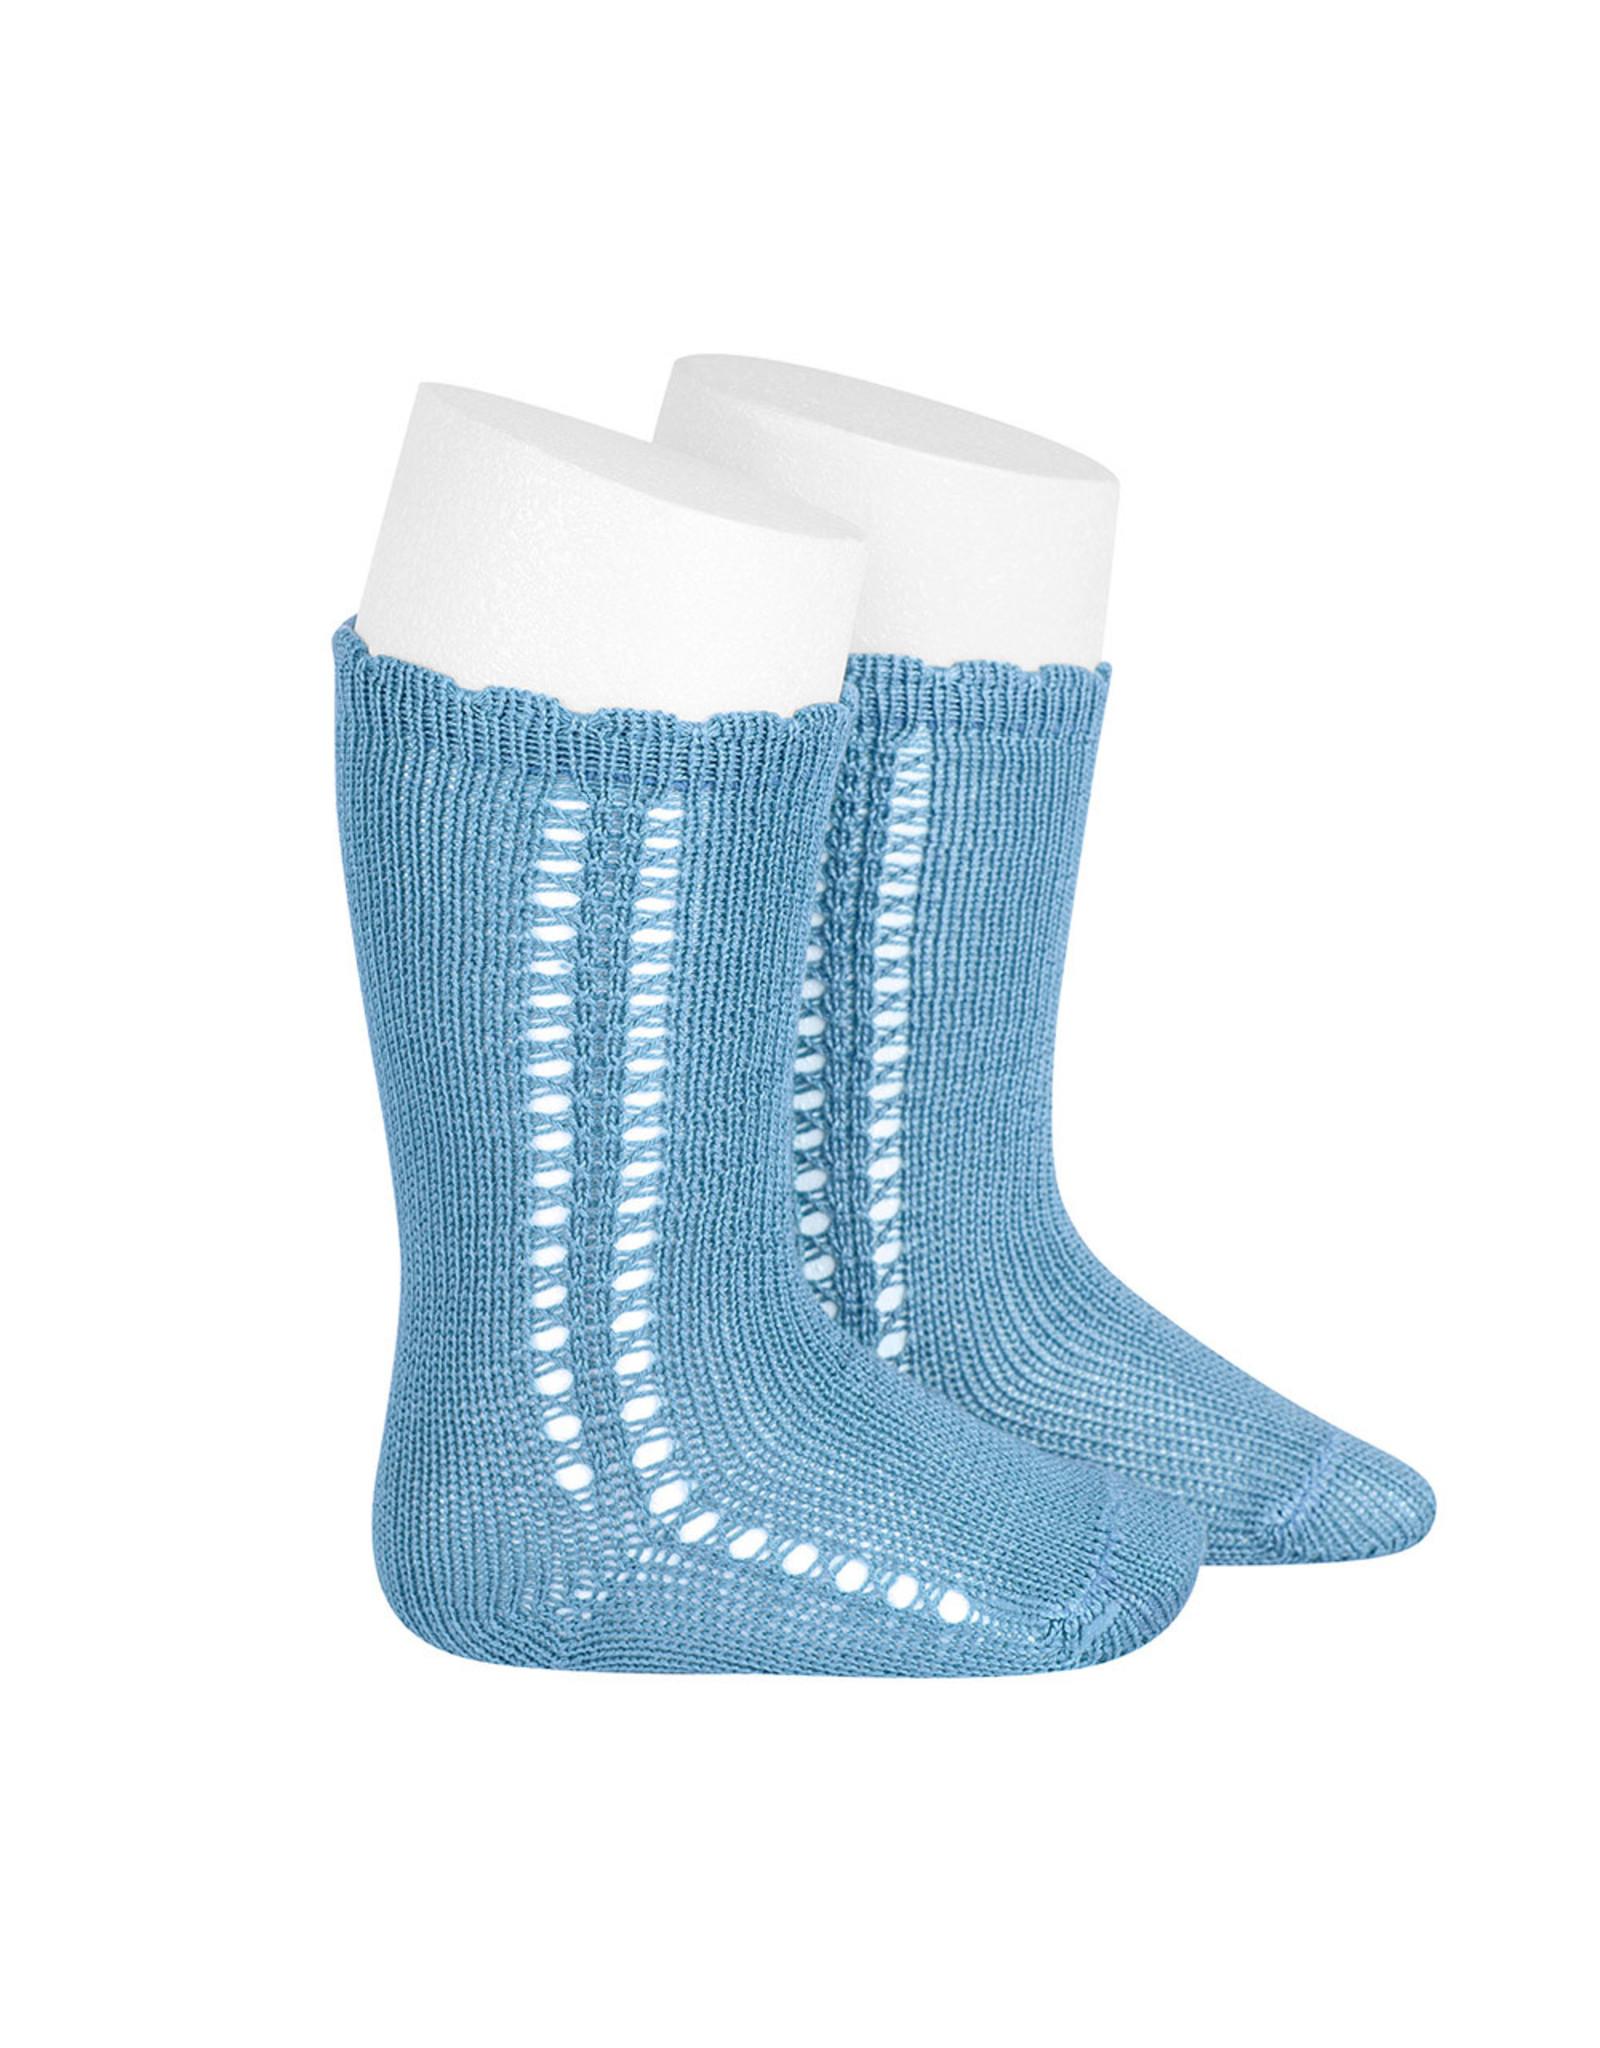 CONDOR Cloud Side Openwork Knee Socks